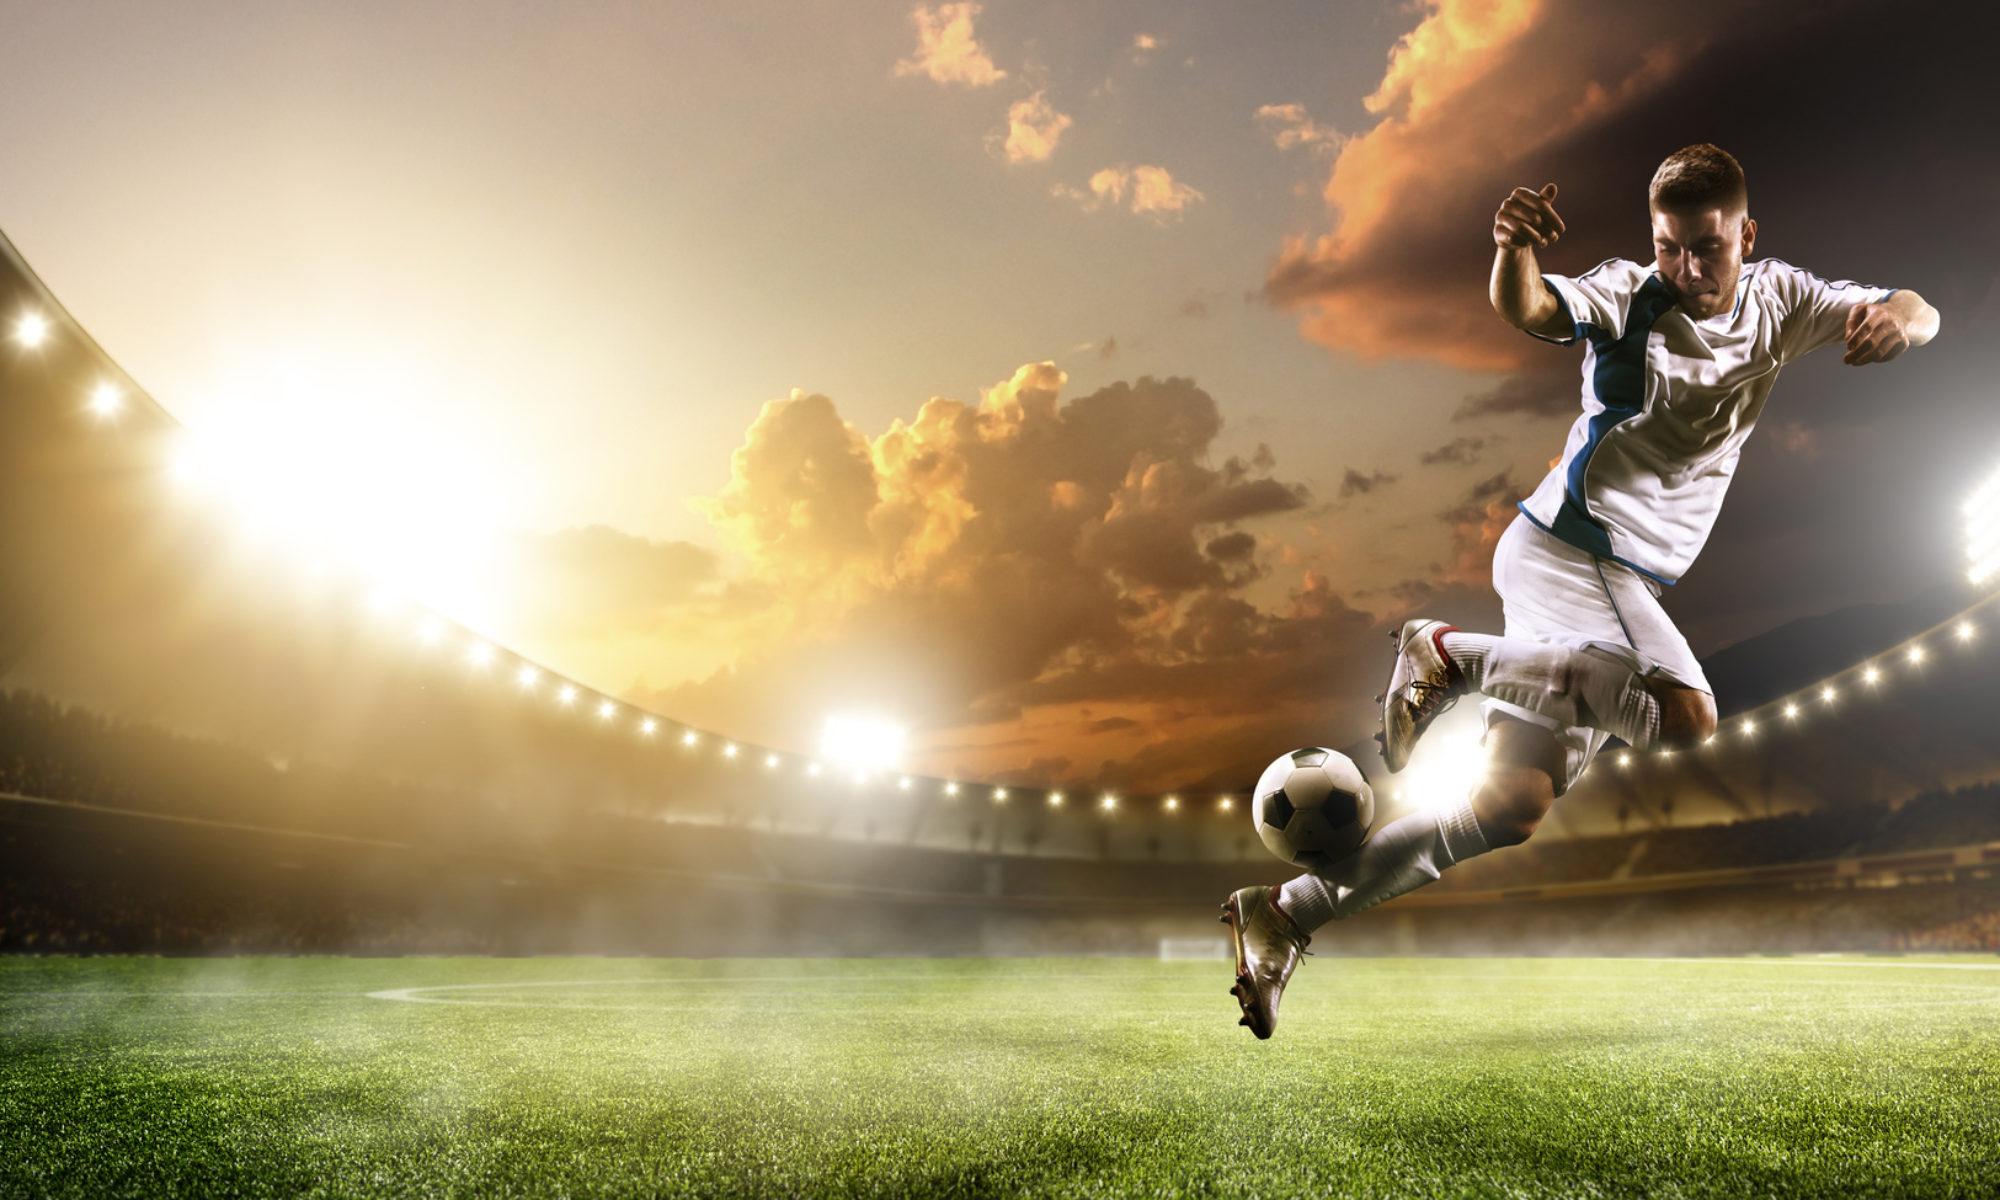 Socceragent24